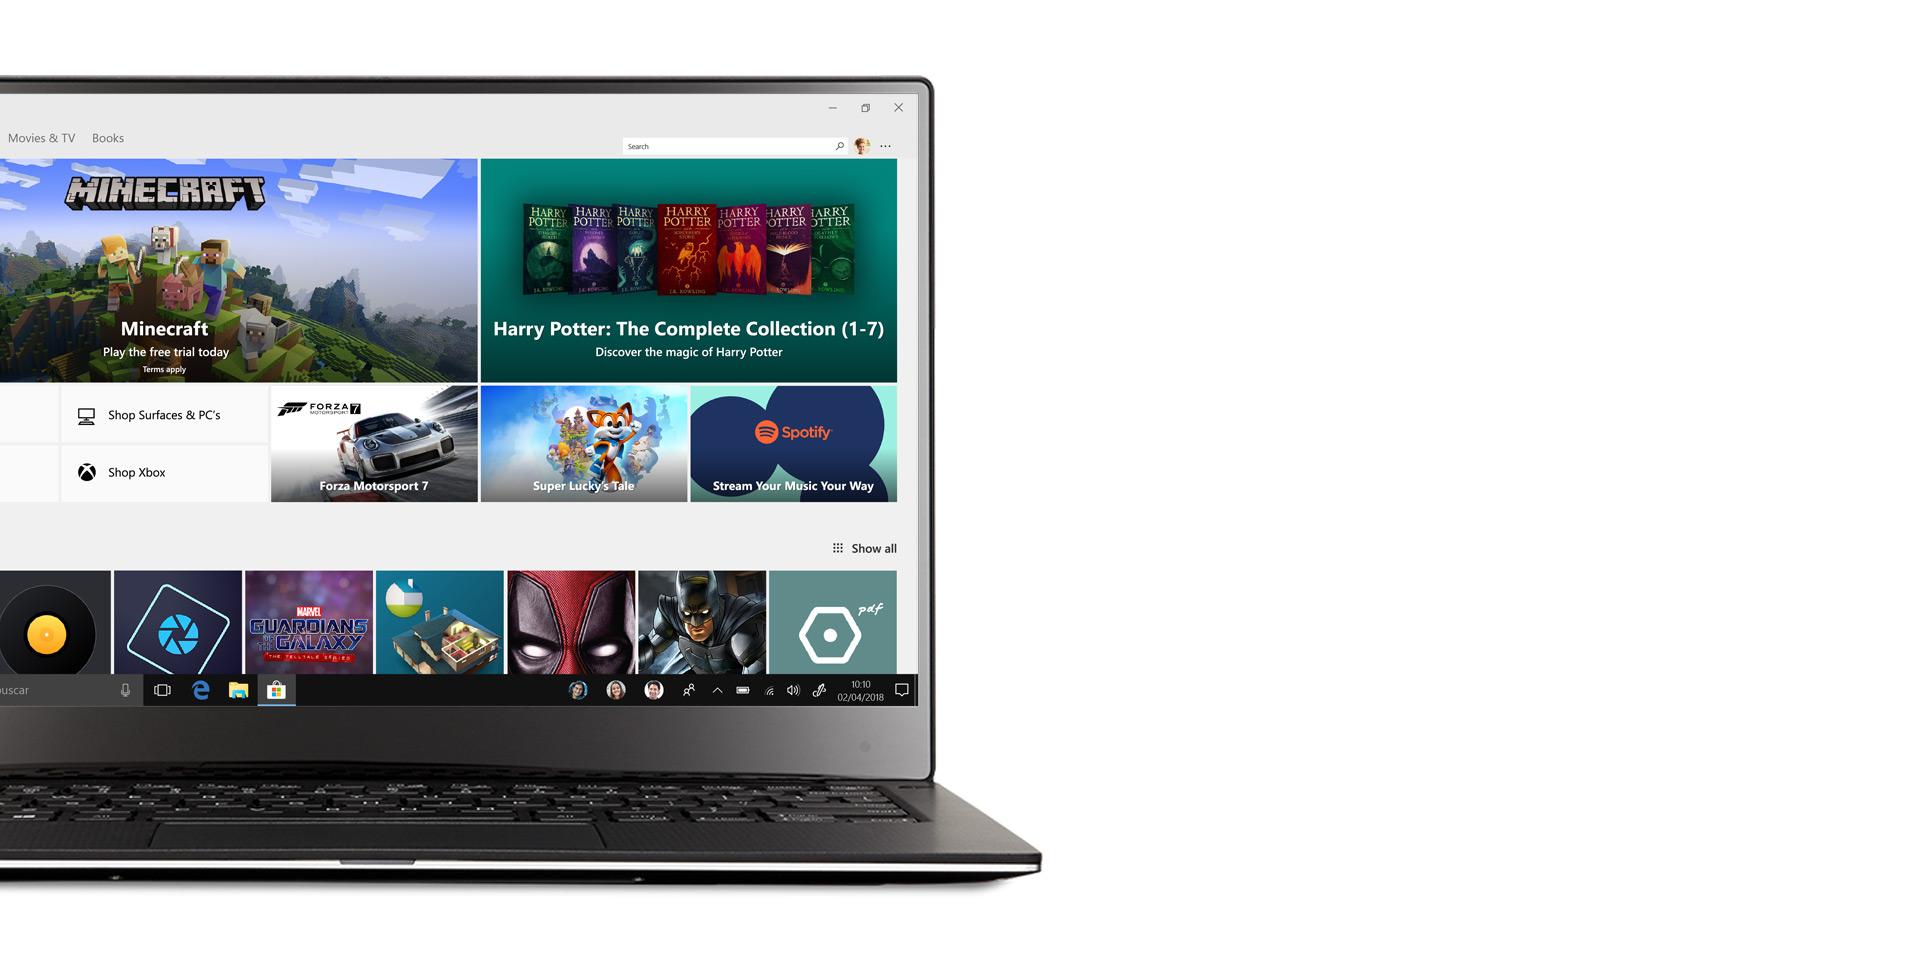 Dispositivo portátil con Microsoft Store en la pantalla